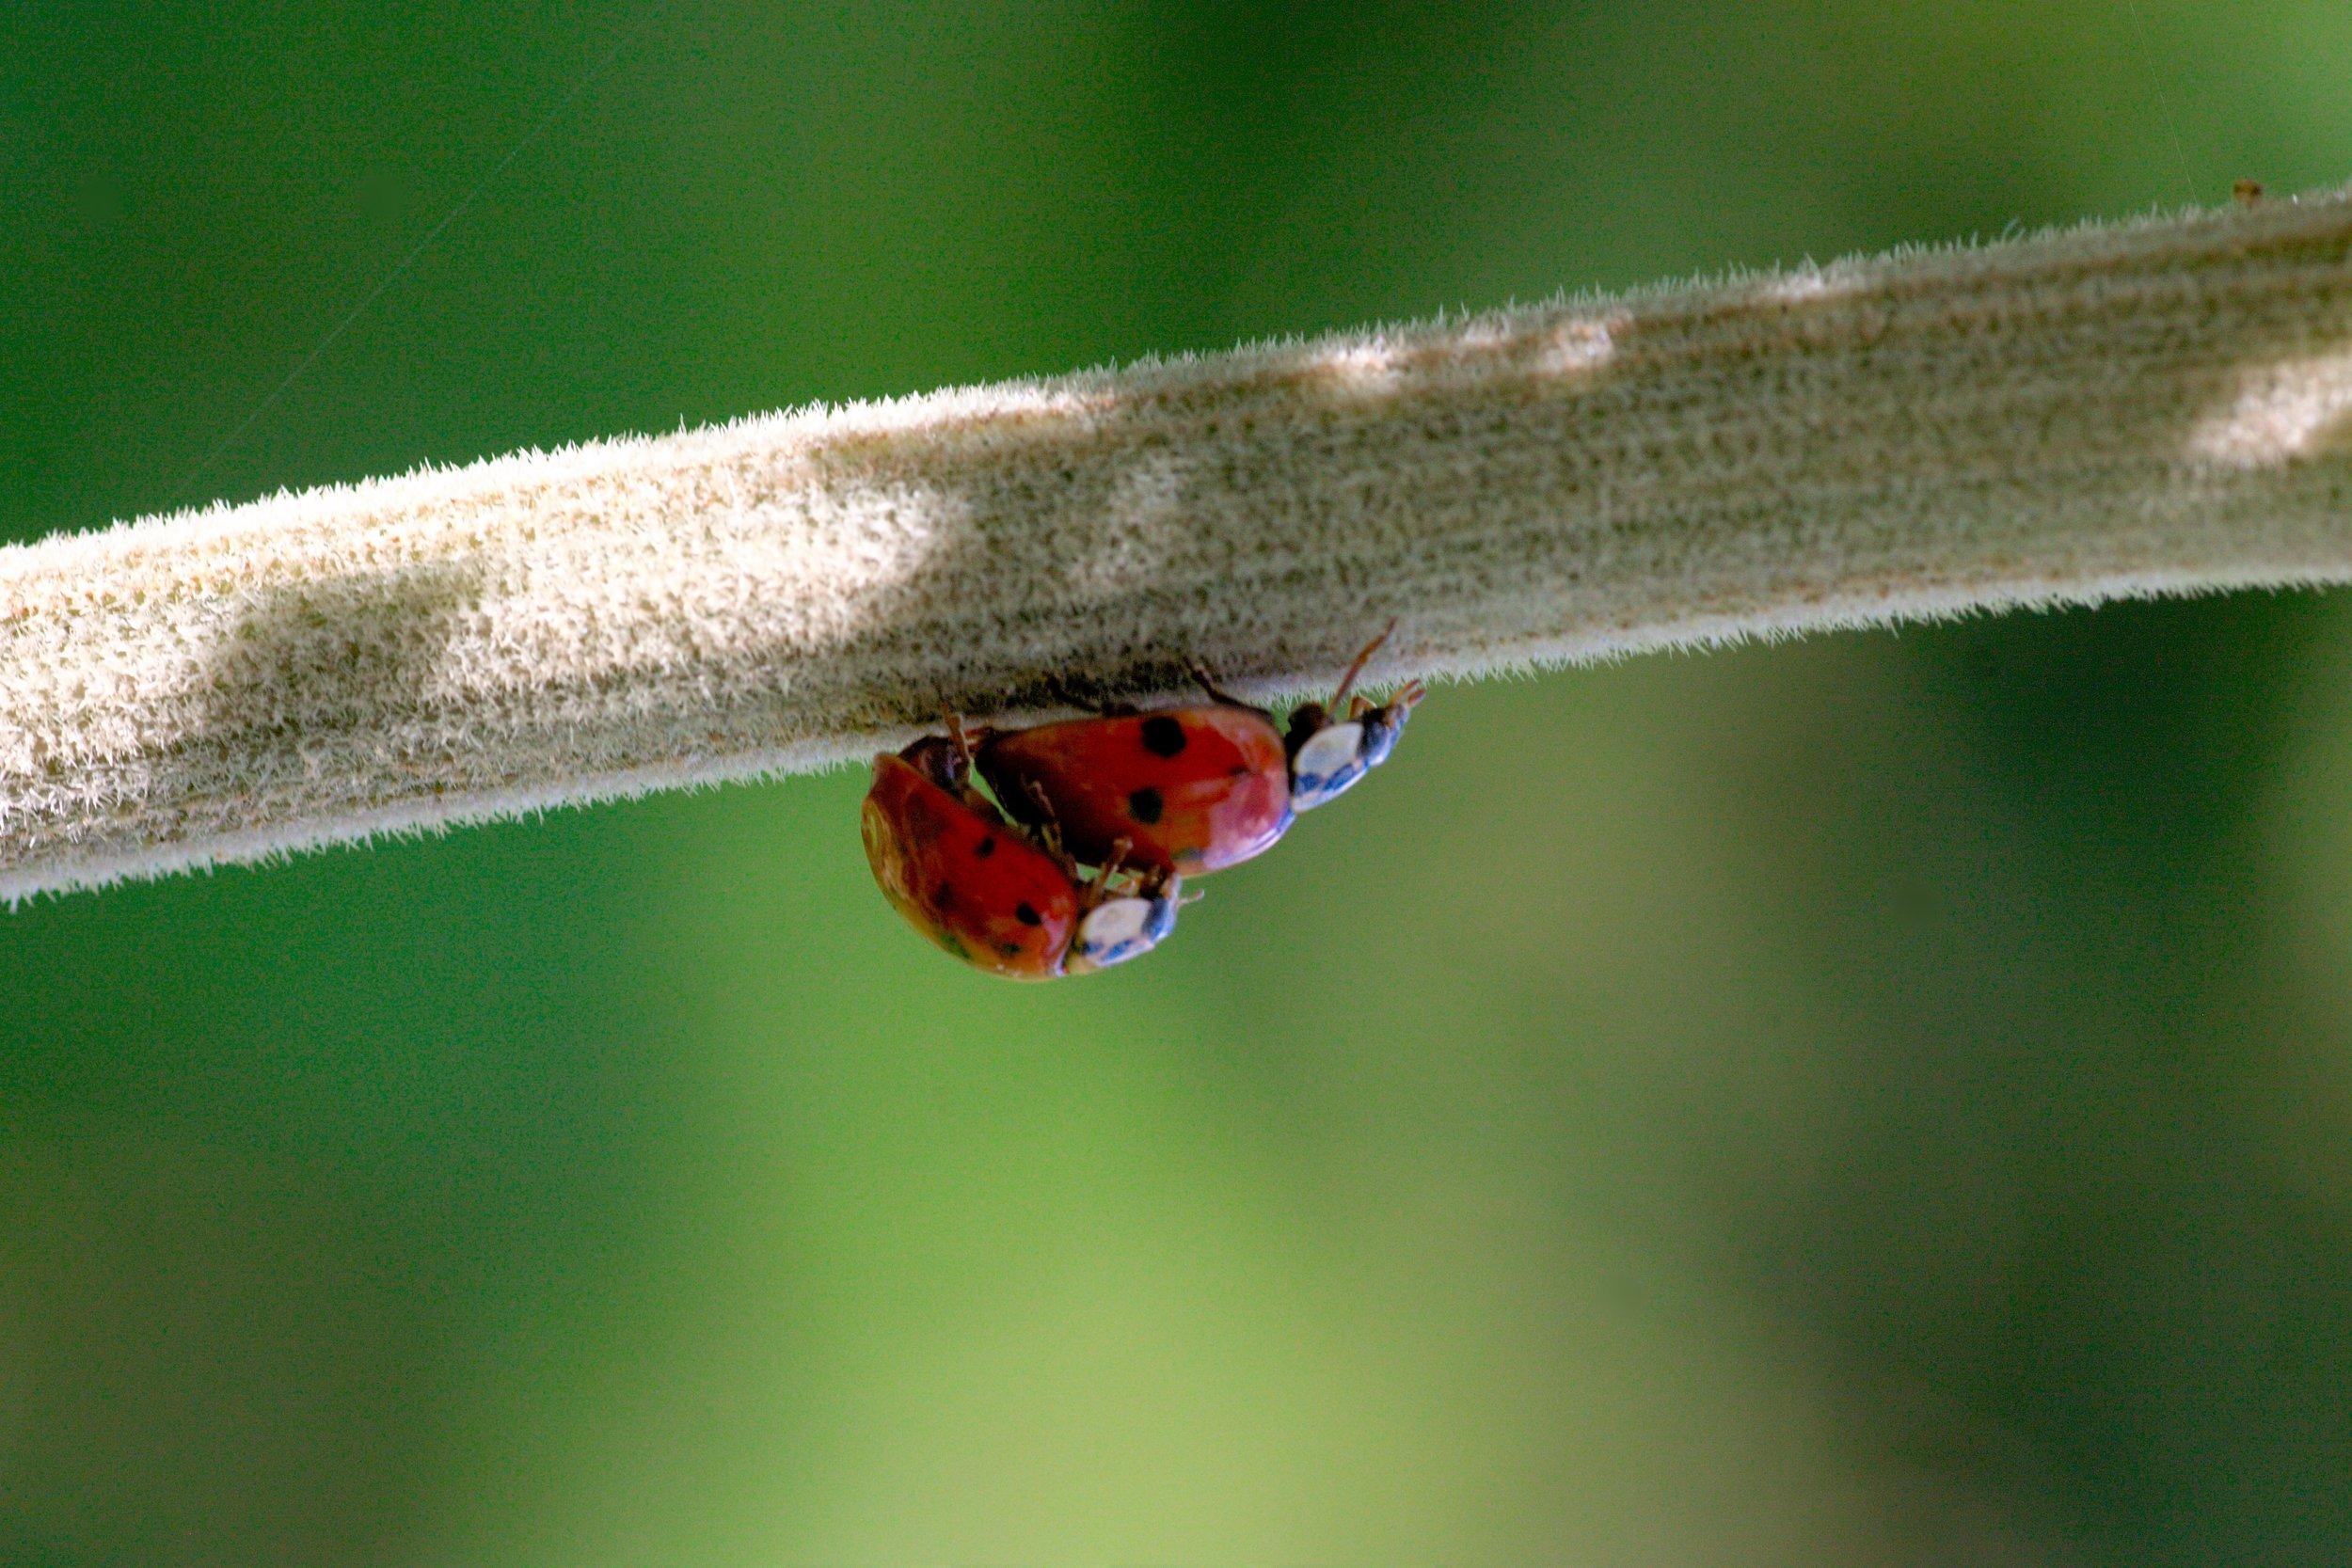 nature-photography-leaf-animal-love-green-1246896-pxhere.com.jpg